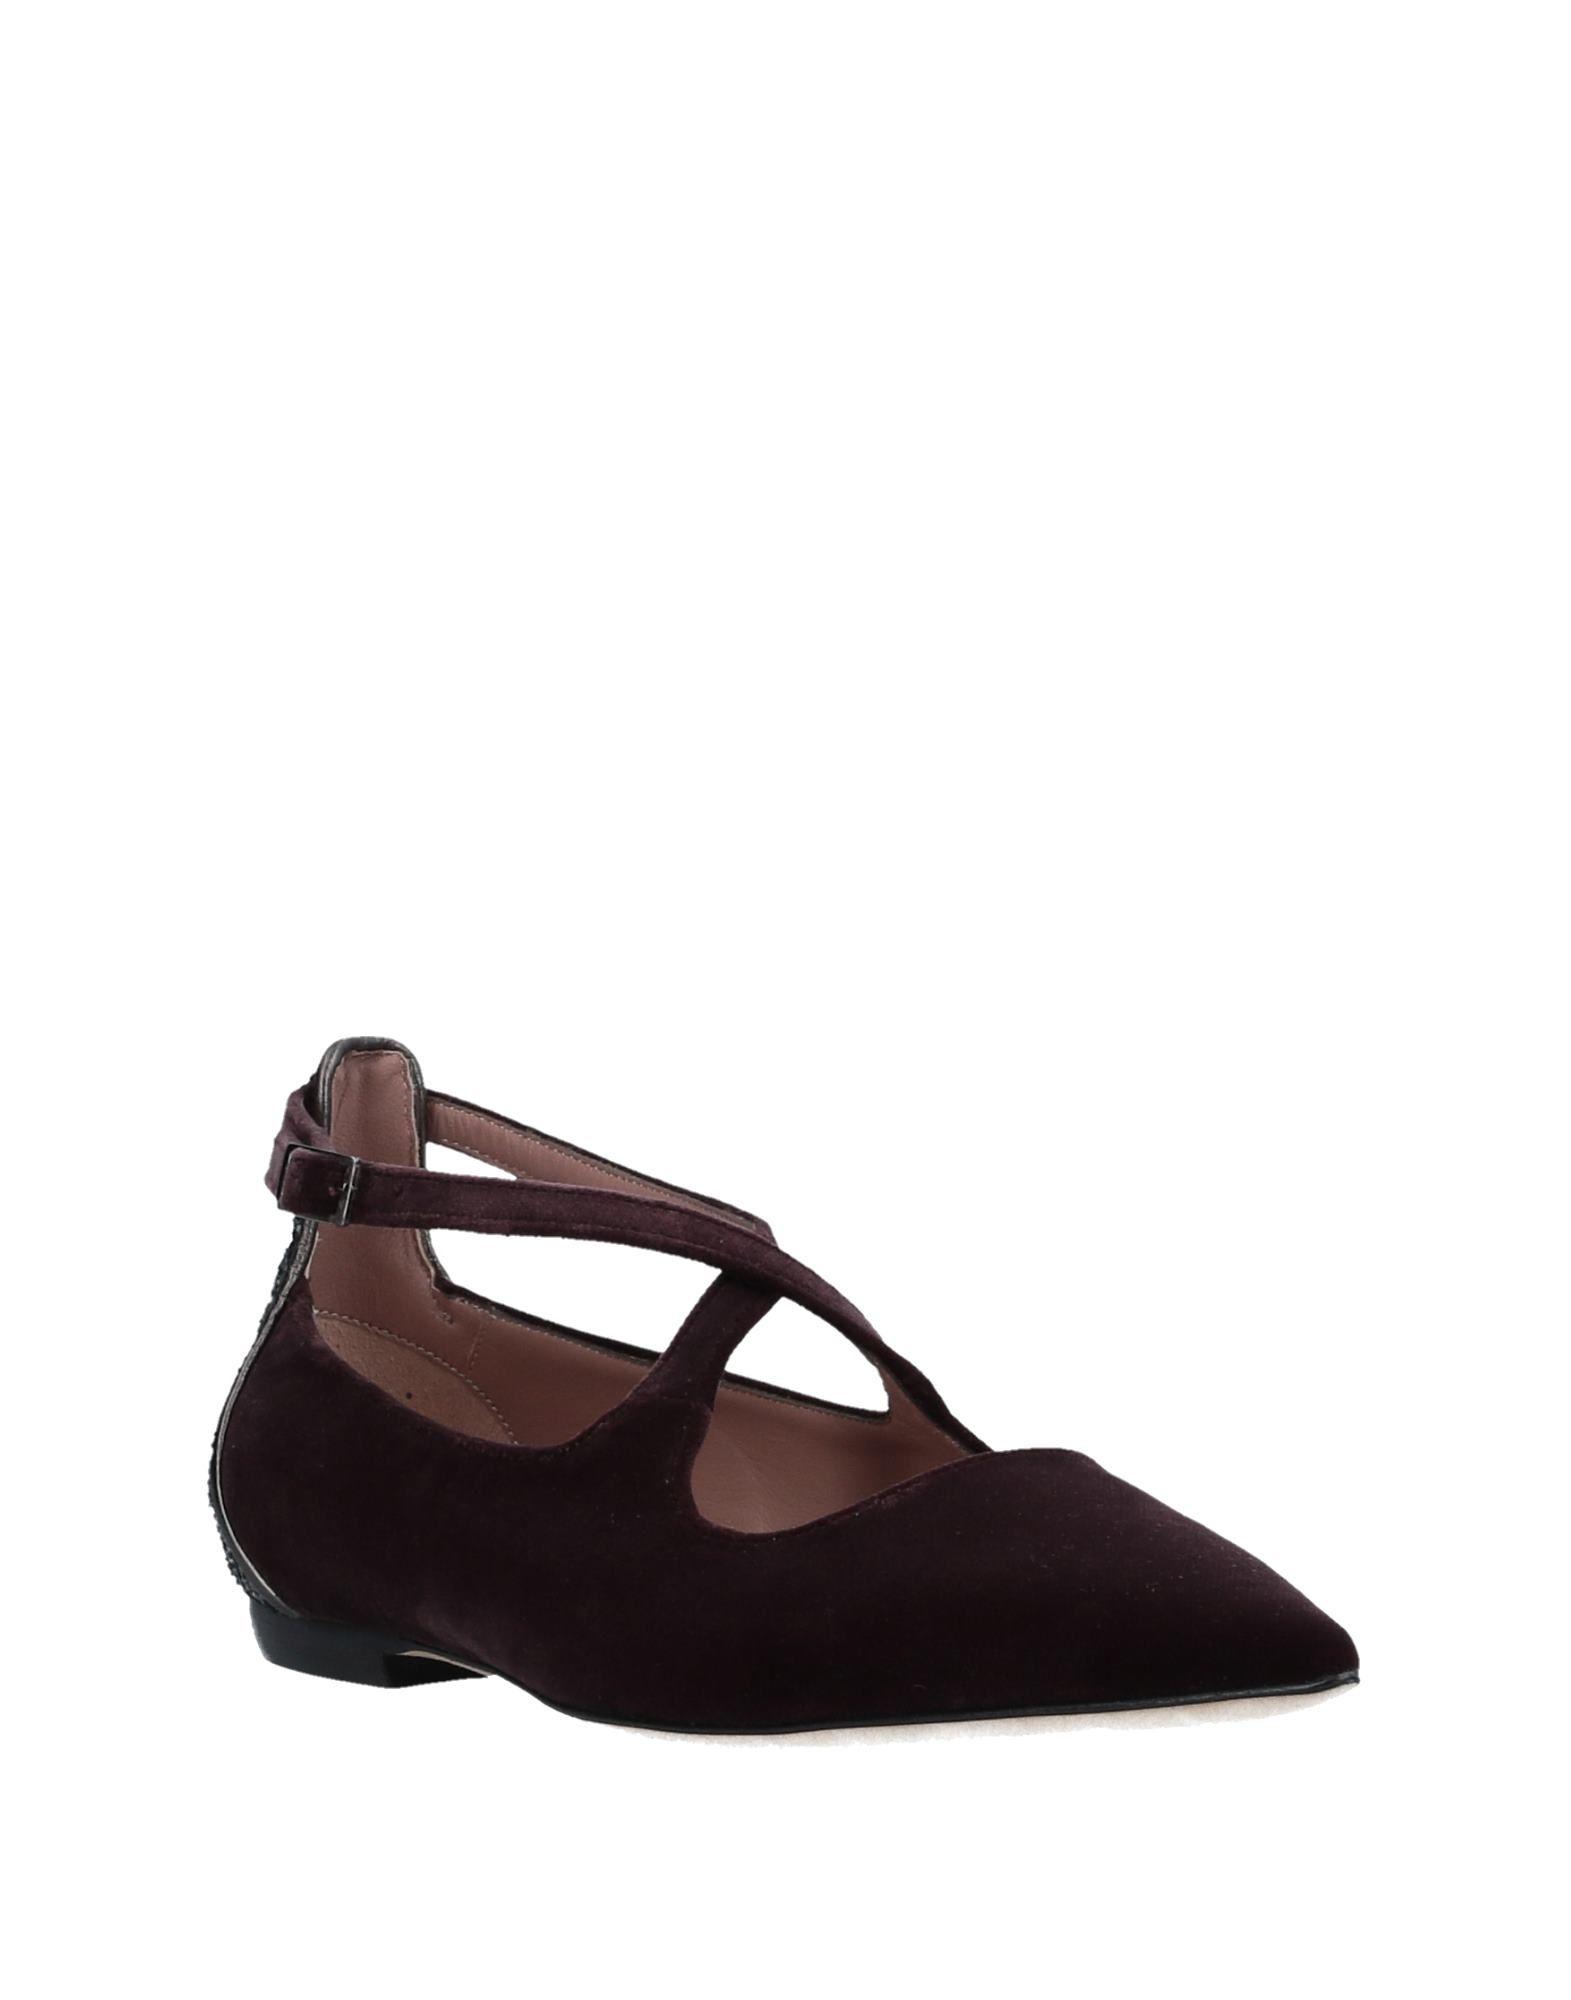 Stilvolle billige Ballerinas Schuhe Gianna Meliani Ballerinas billige Damen  11507076DG 624eaa